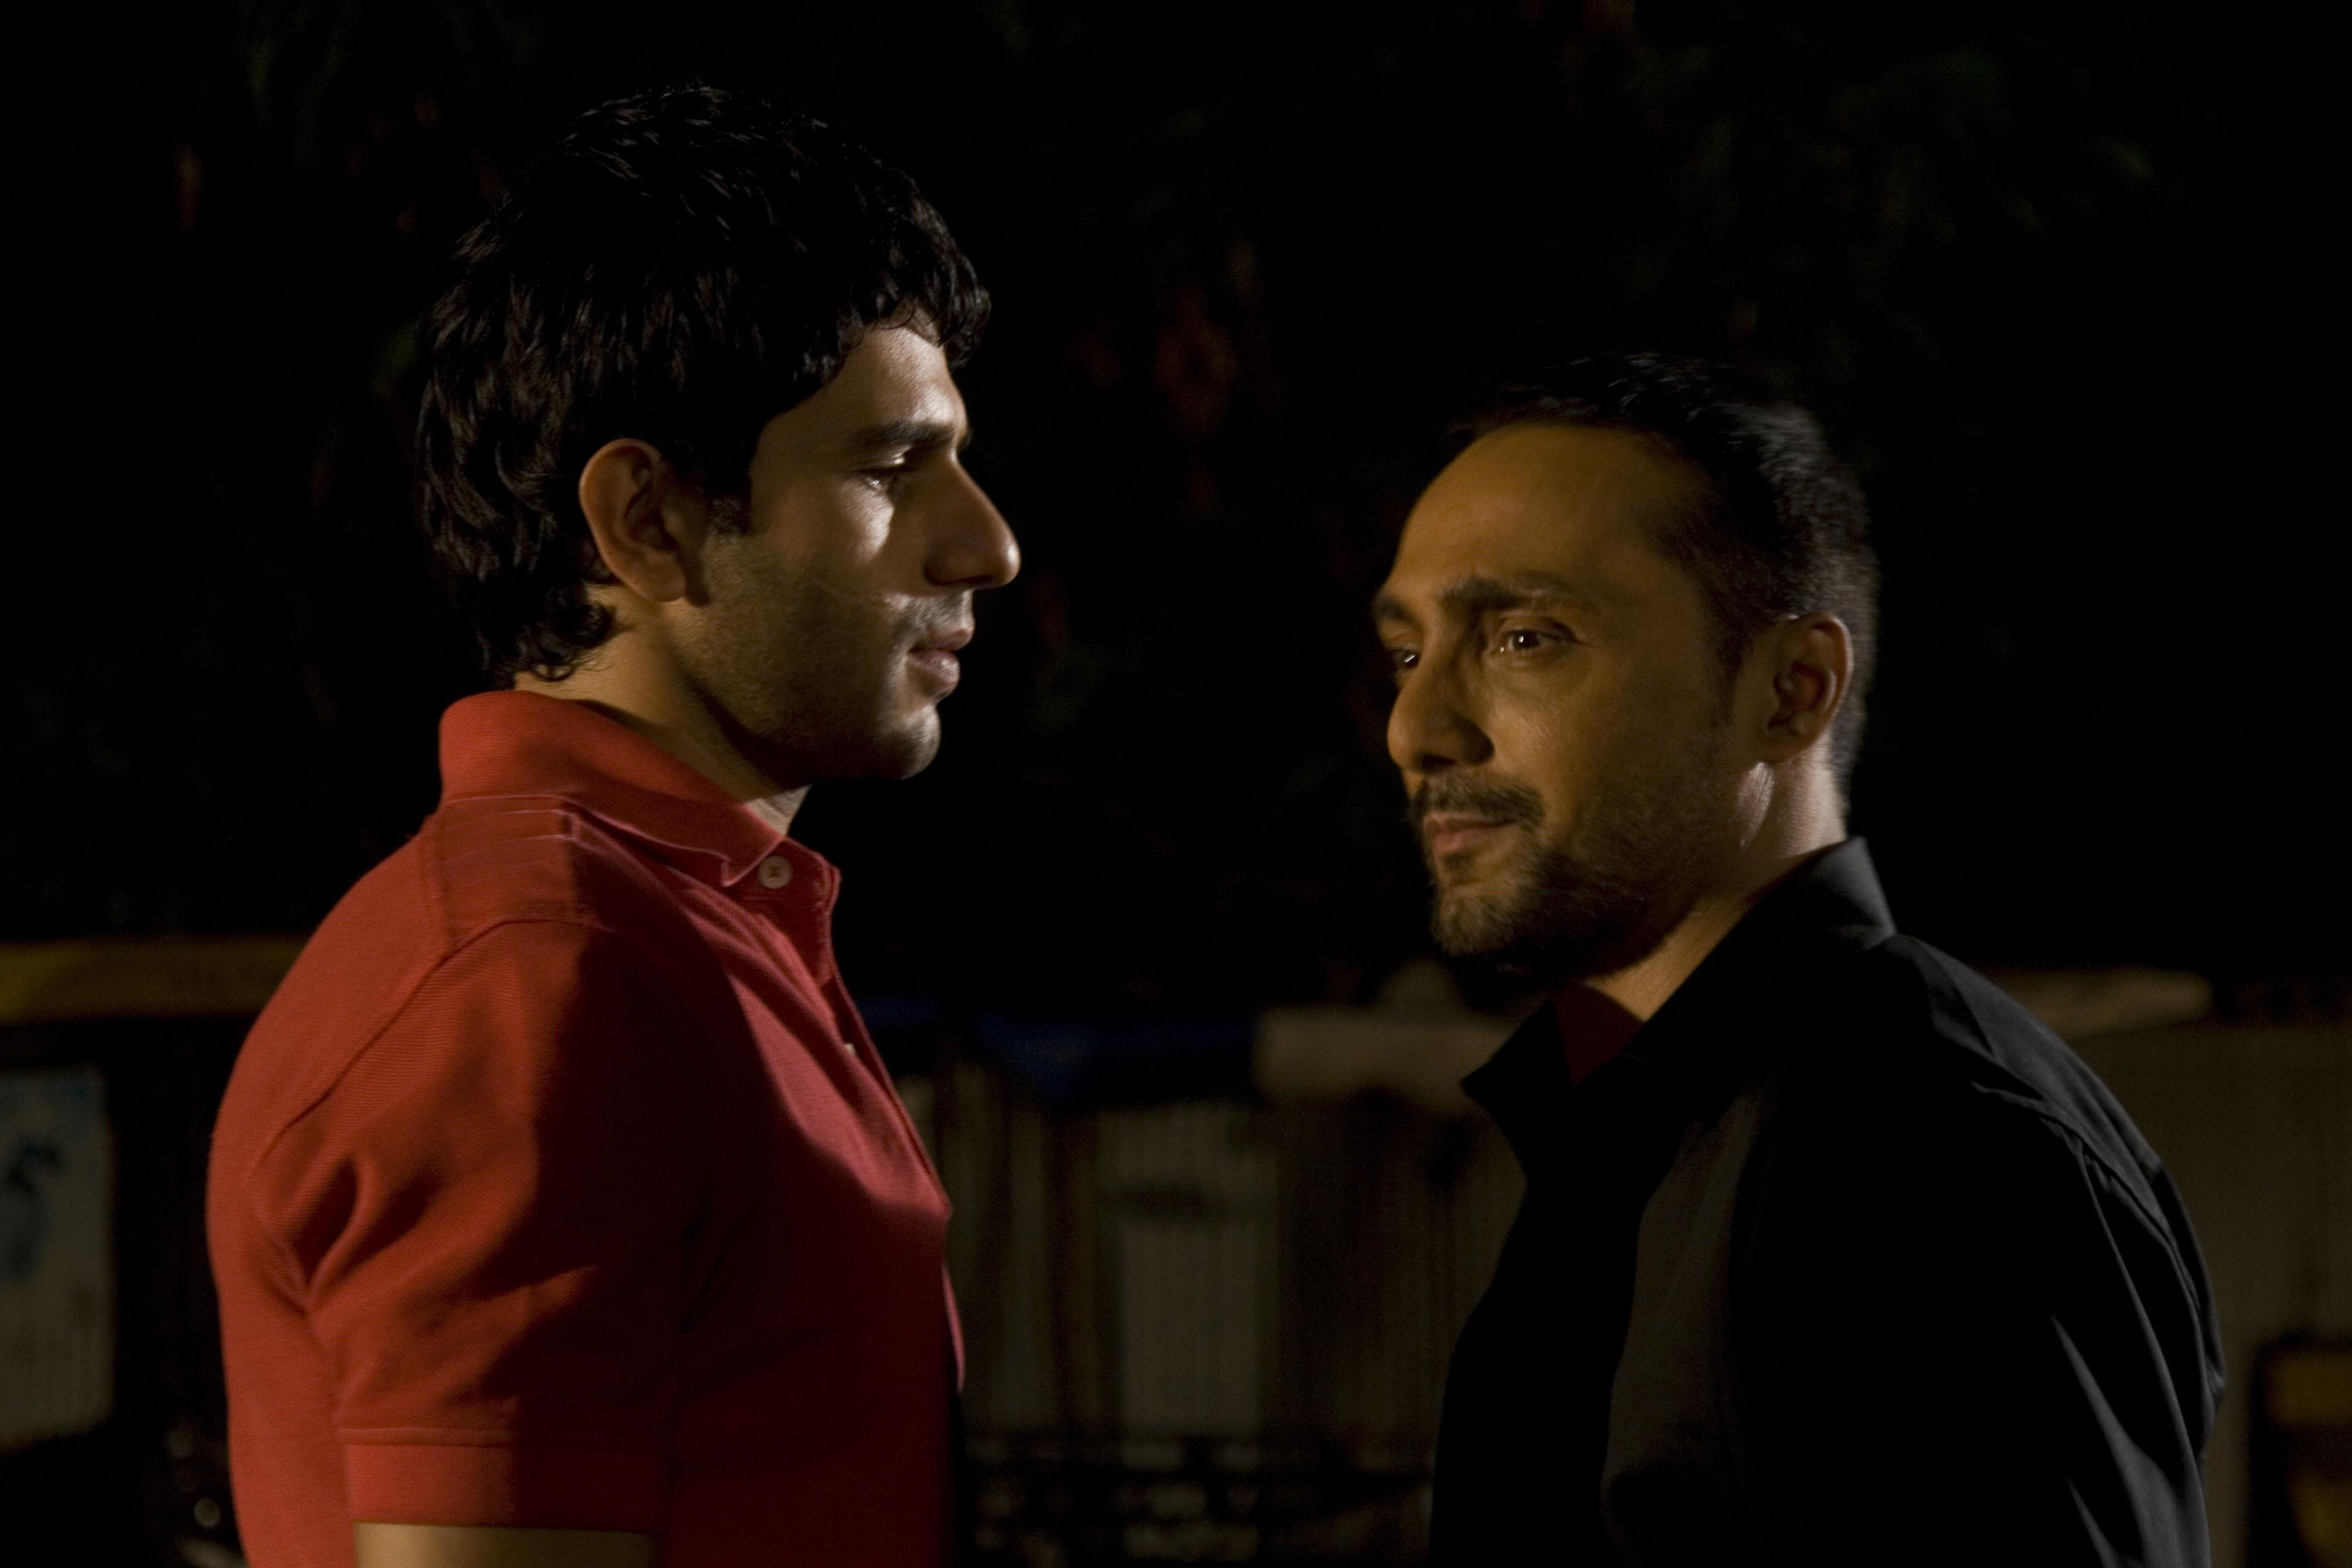 Rahul Bose and Arjun Mathur